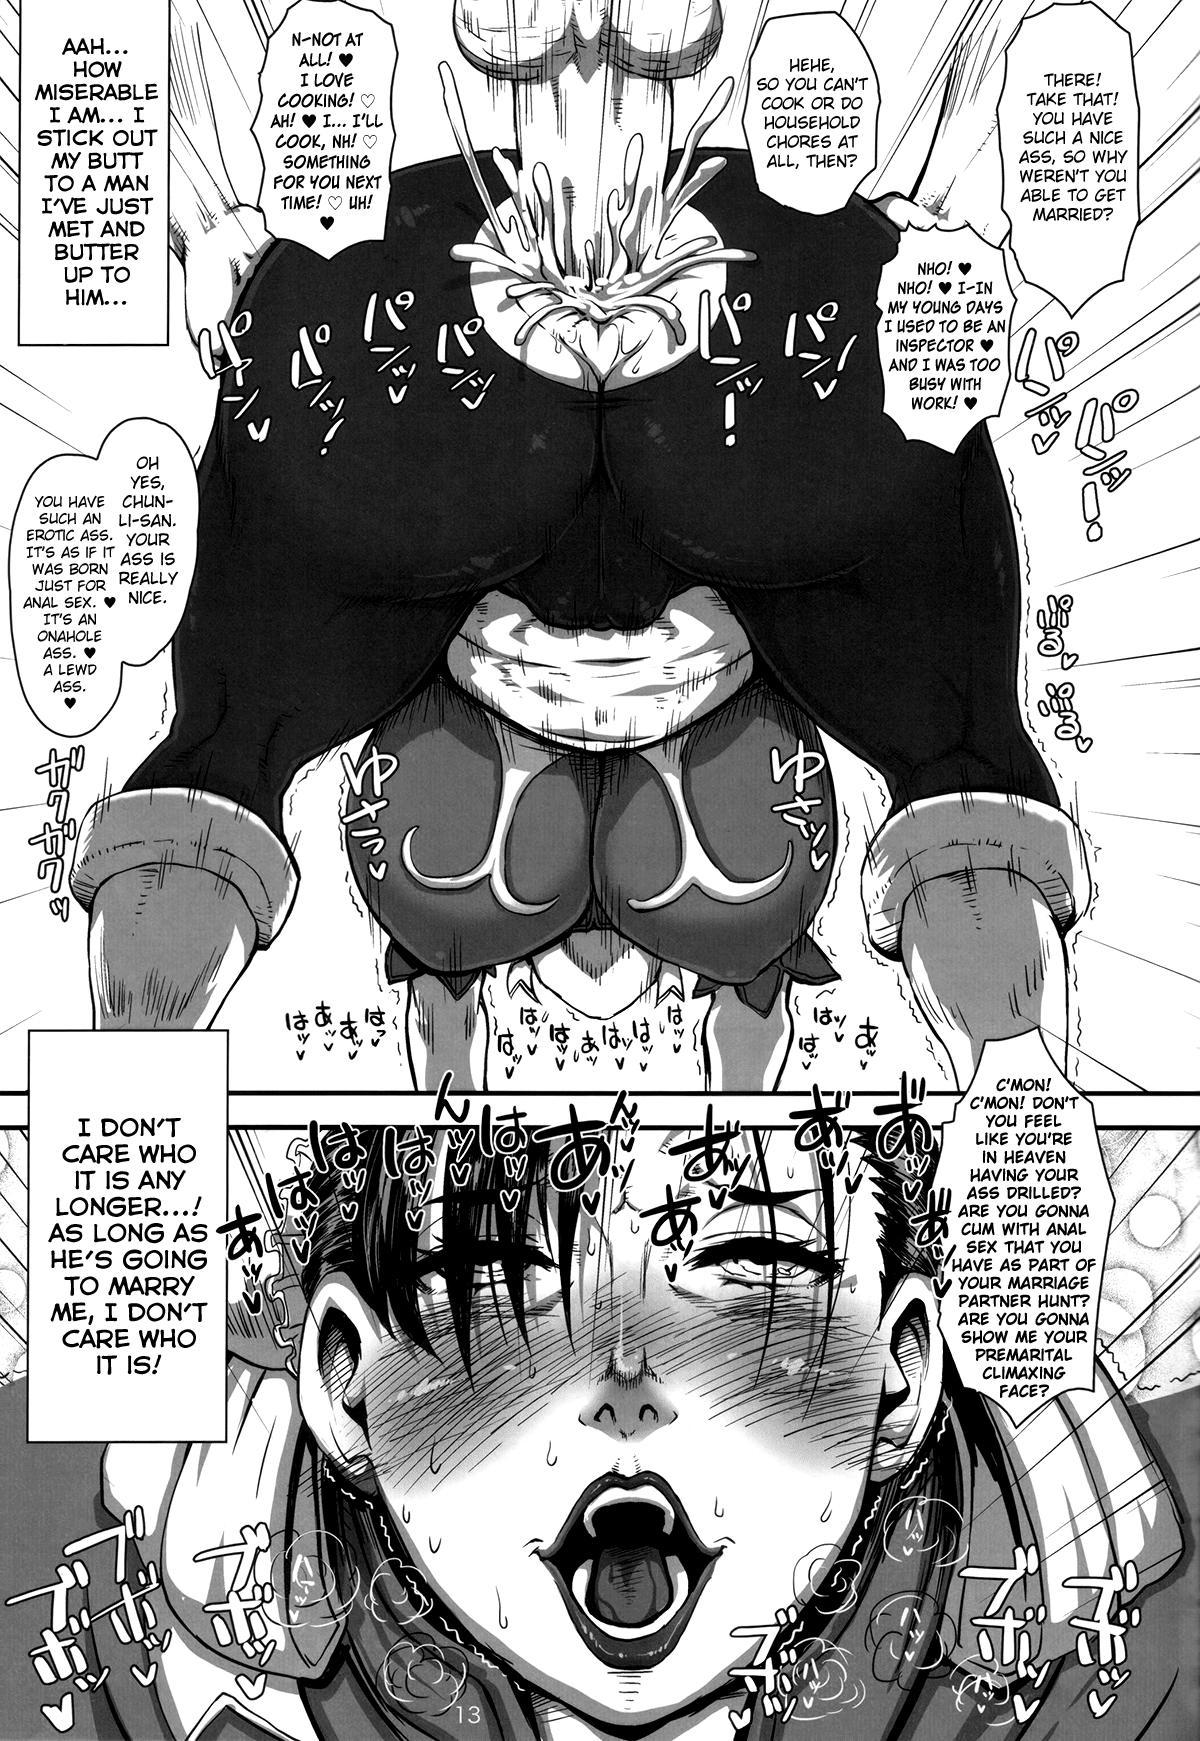 (C87) [8graphica (Yoshitama Ichirou, Nanakichi)] METABOLISM Chun-Li A Beautiful and Mature Chun-Li-san has Serious Sex with the Candidates while Looking For a Marriage Partner. (Street Fighter) [English] [biribiri] 11